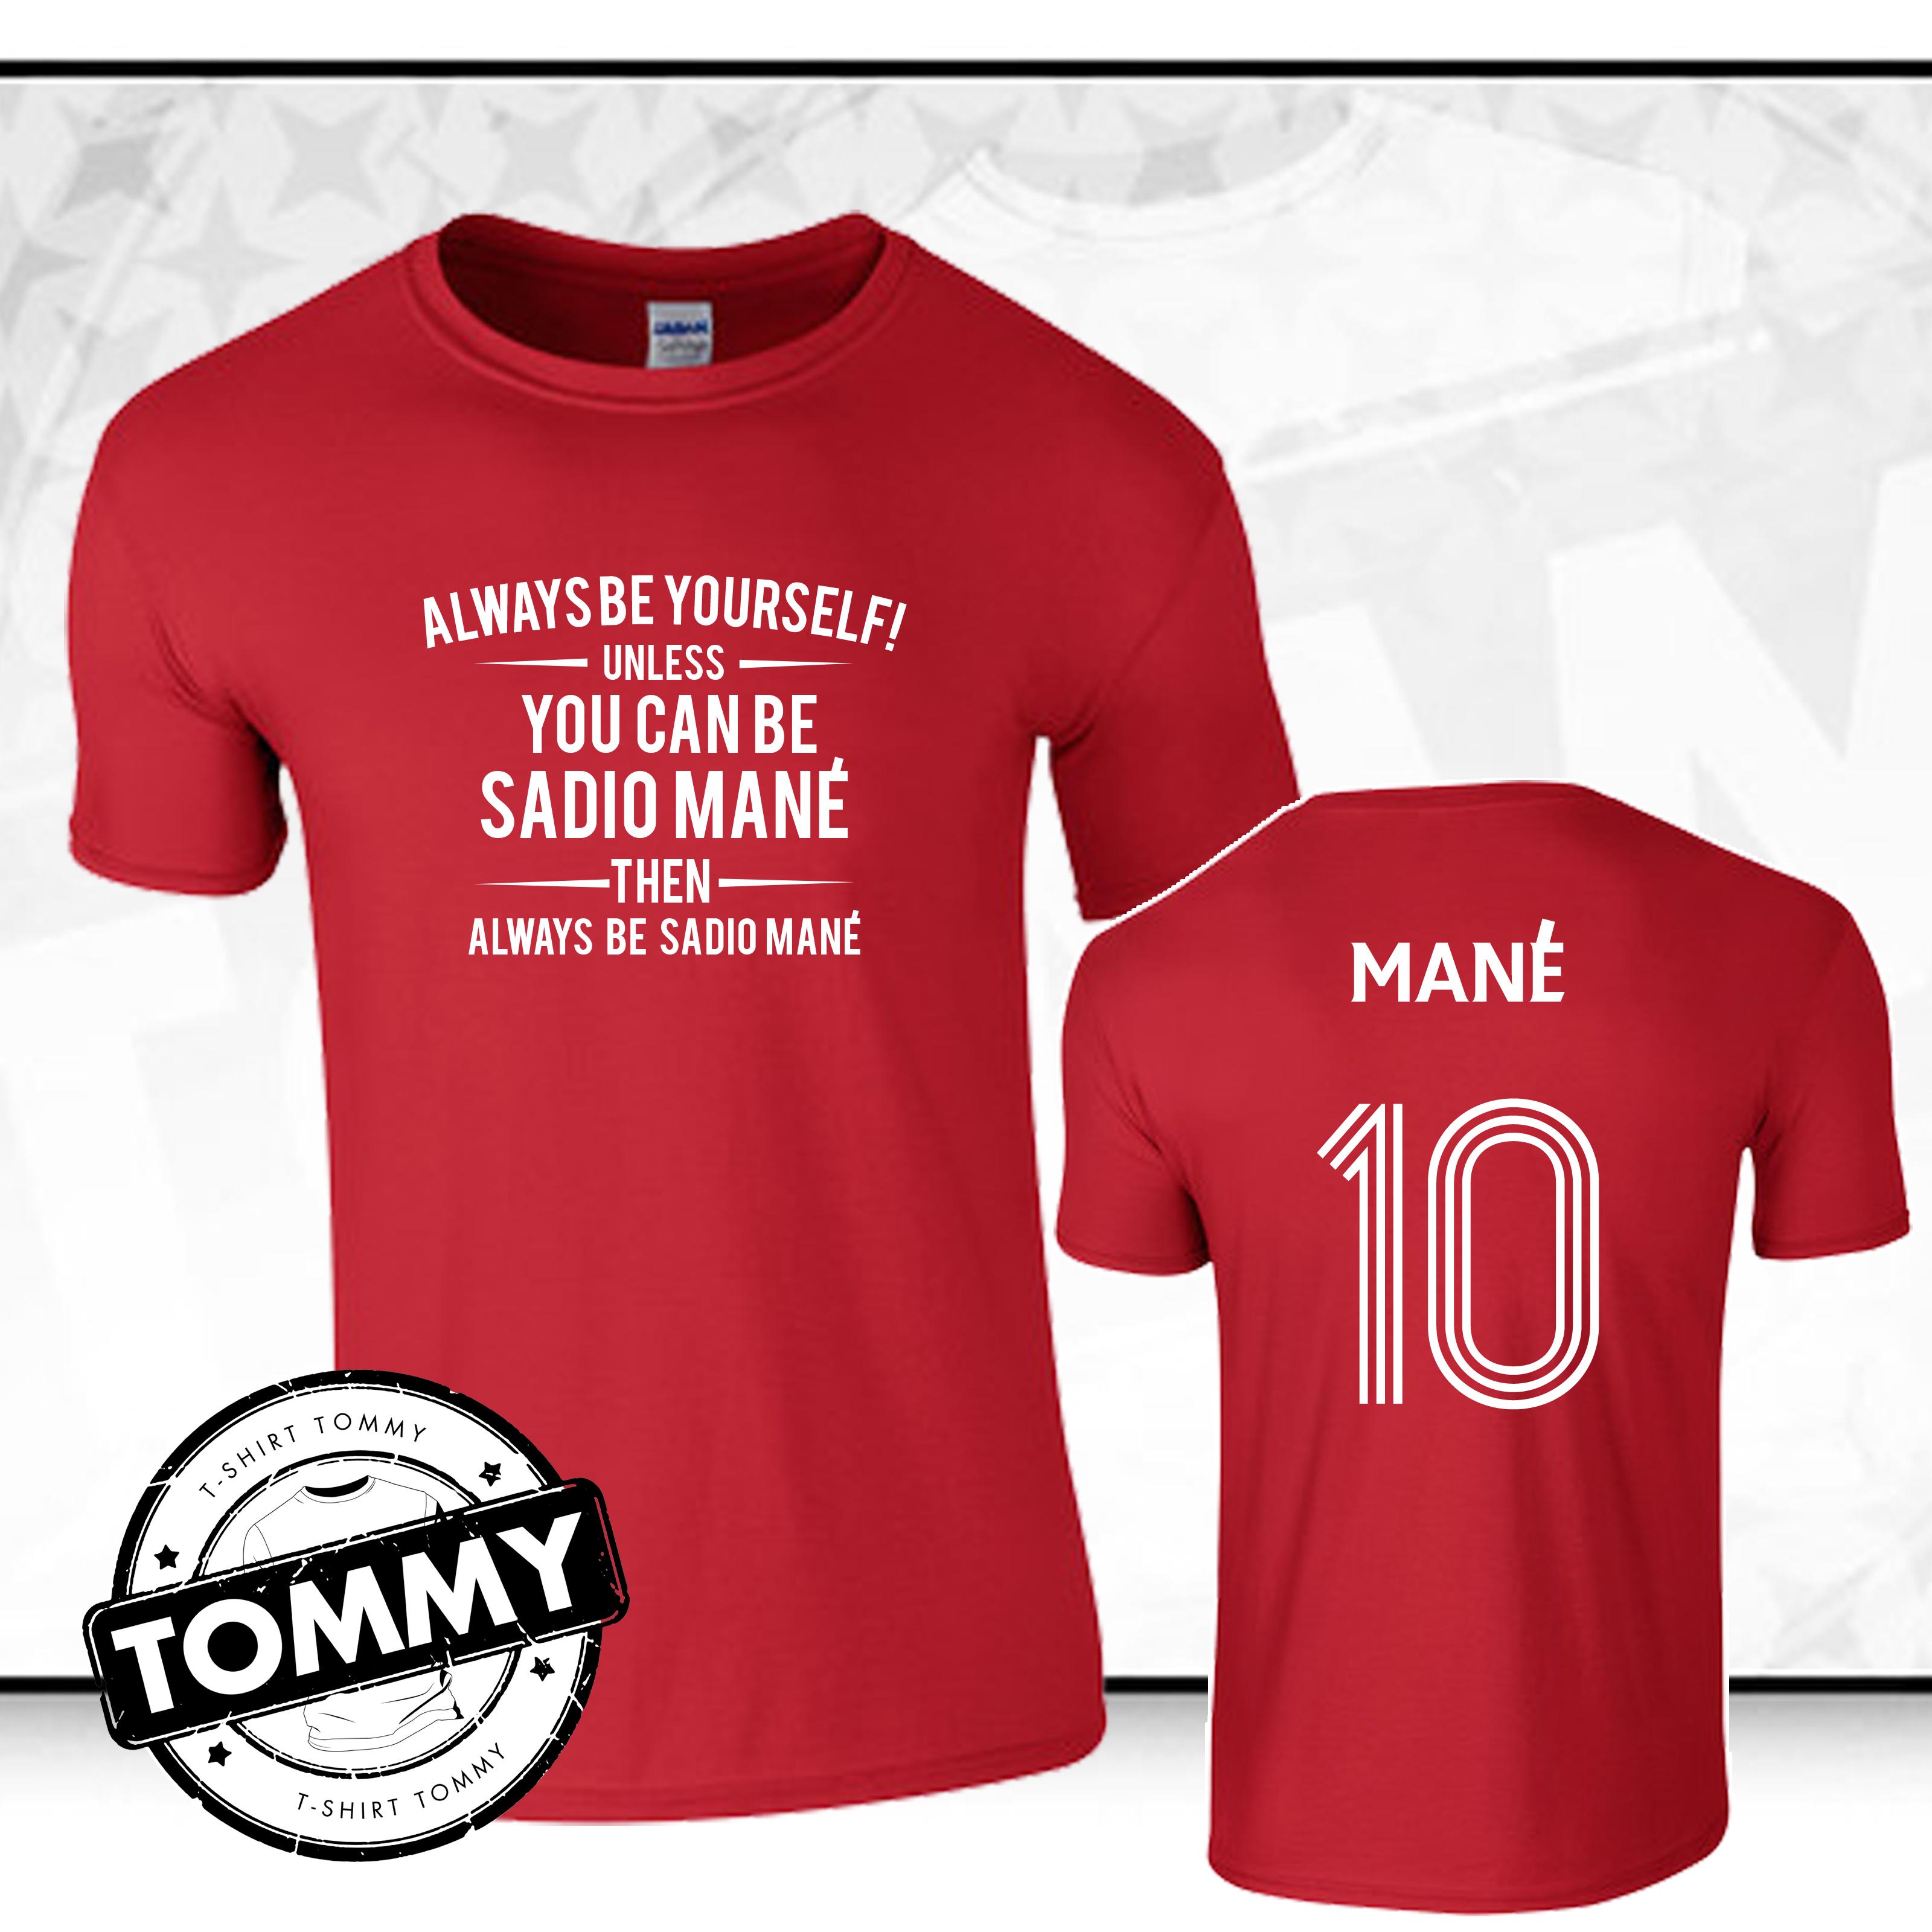 huge discount 33cf8 cfa7d Details about Liverpool Always Be... Mane T-Shirt Liverpool Sadio Mane,  YNWA T-Shirt